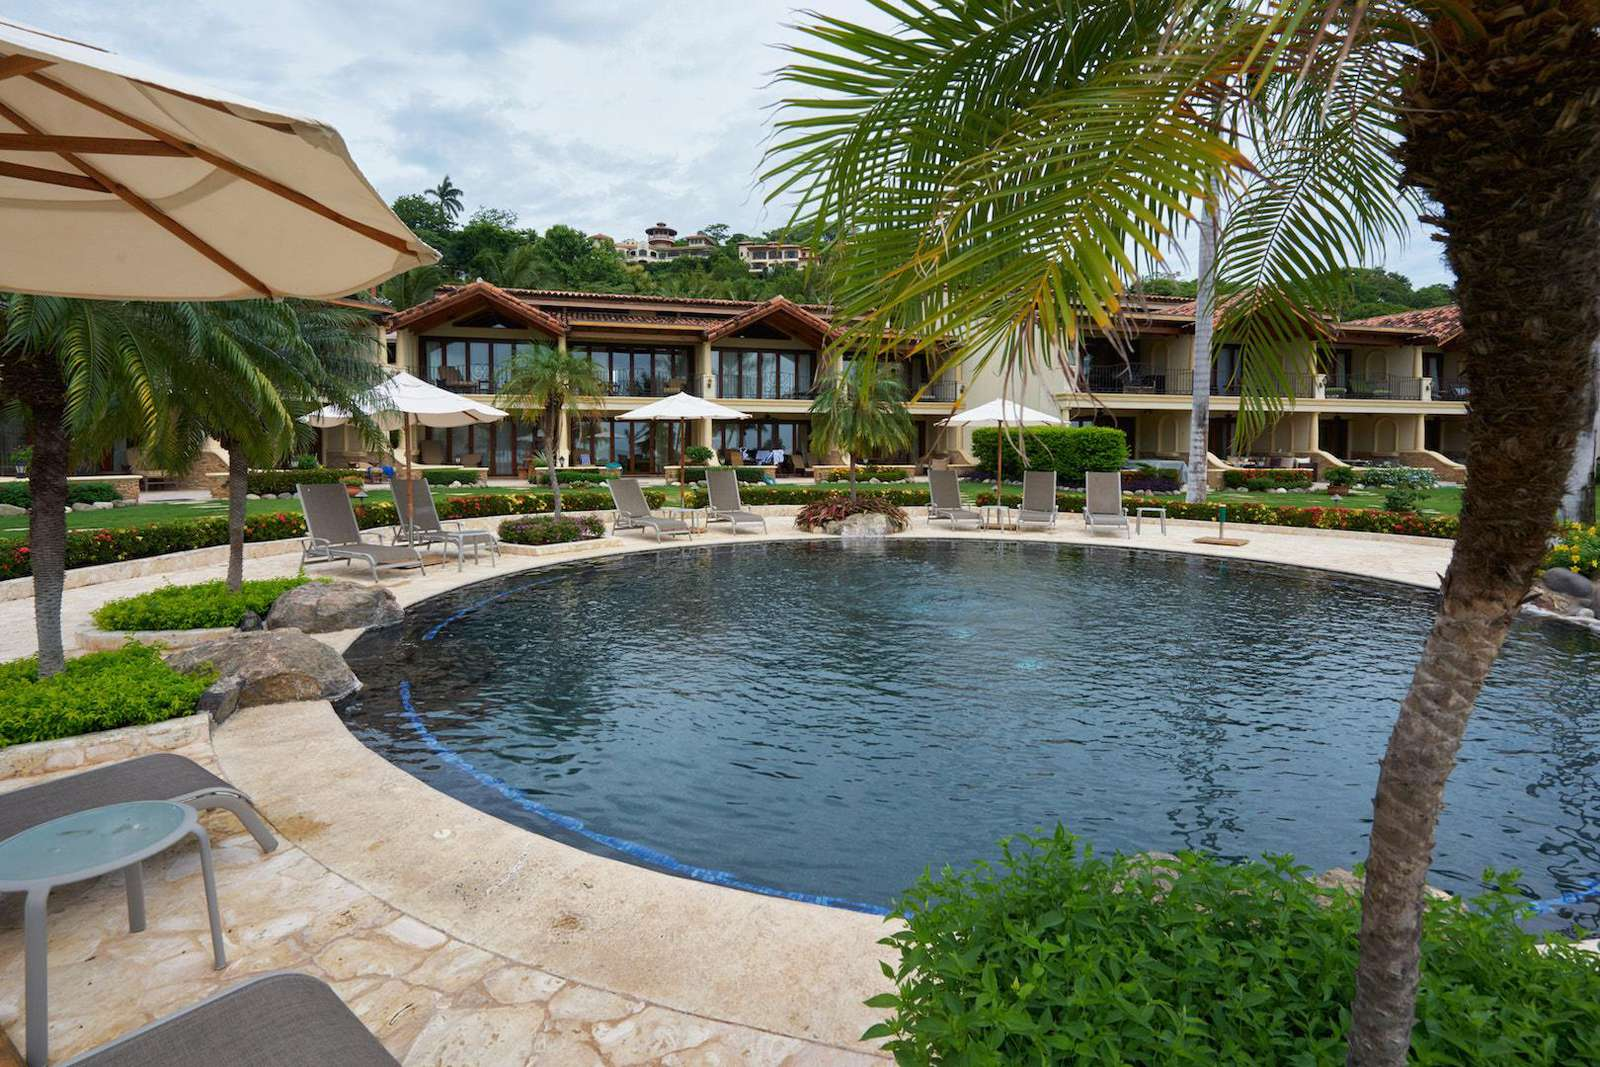 Spacious resort-style pool